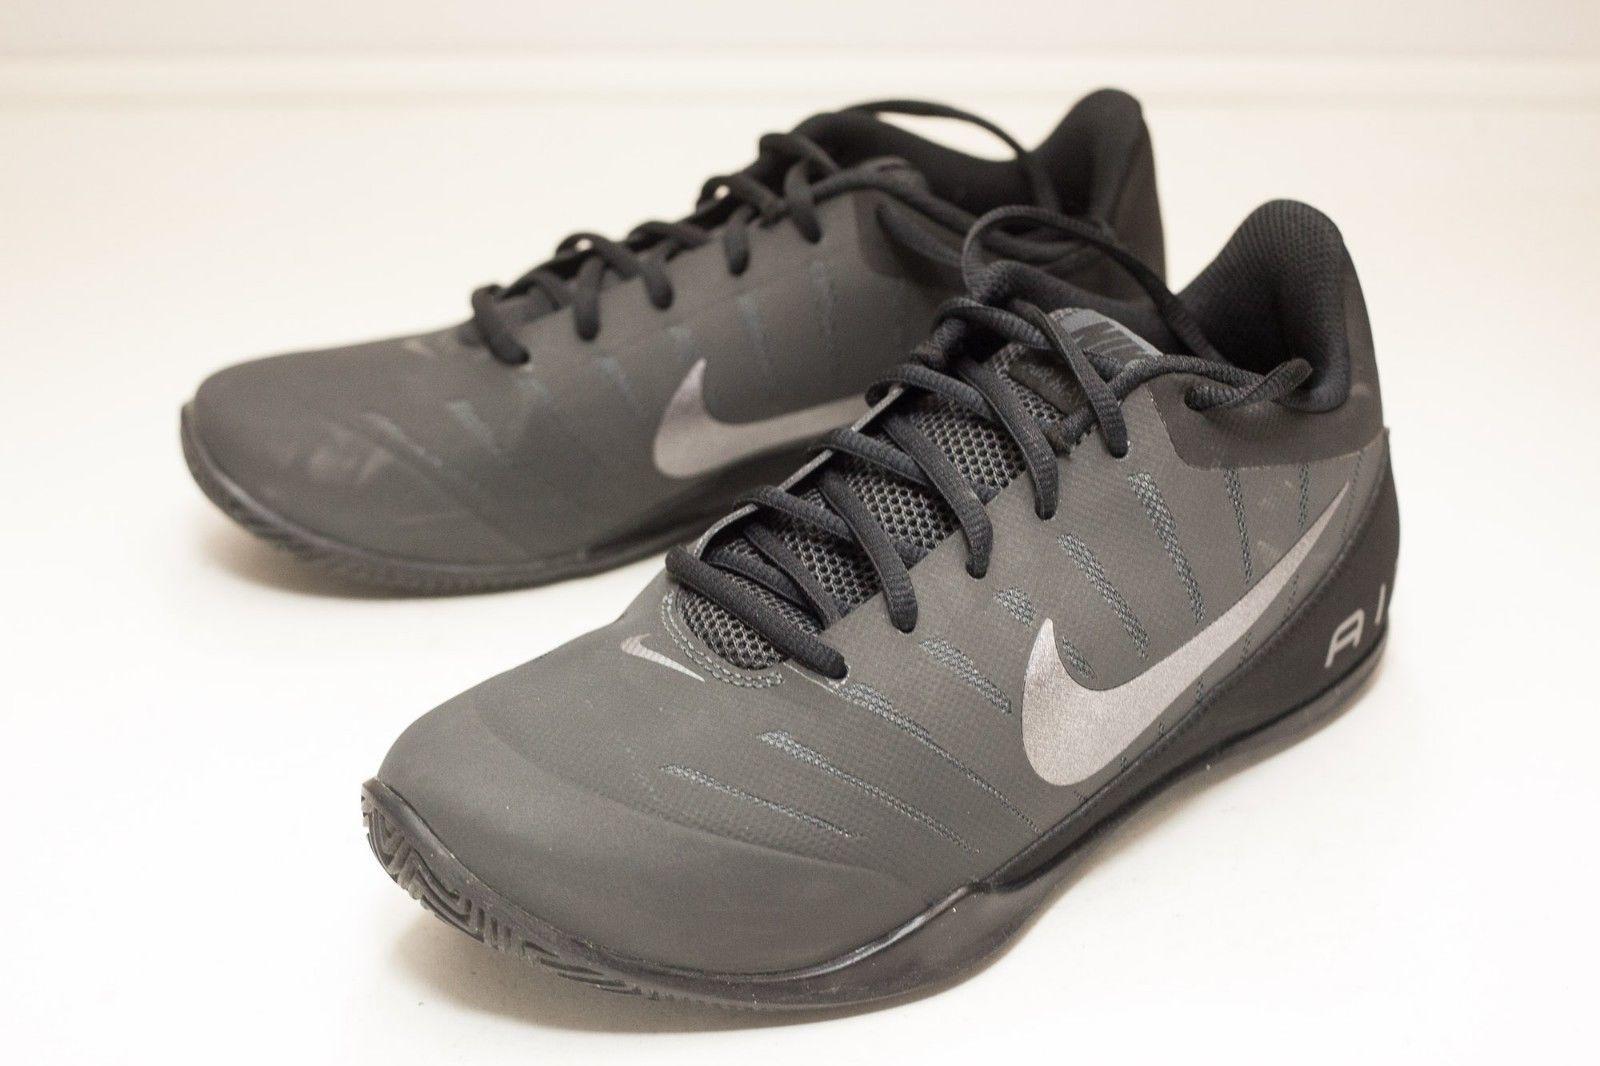 online retailer ca984 2500d Nike Air Mavin Size 7 Gray Basketball Shoes Men s